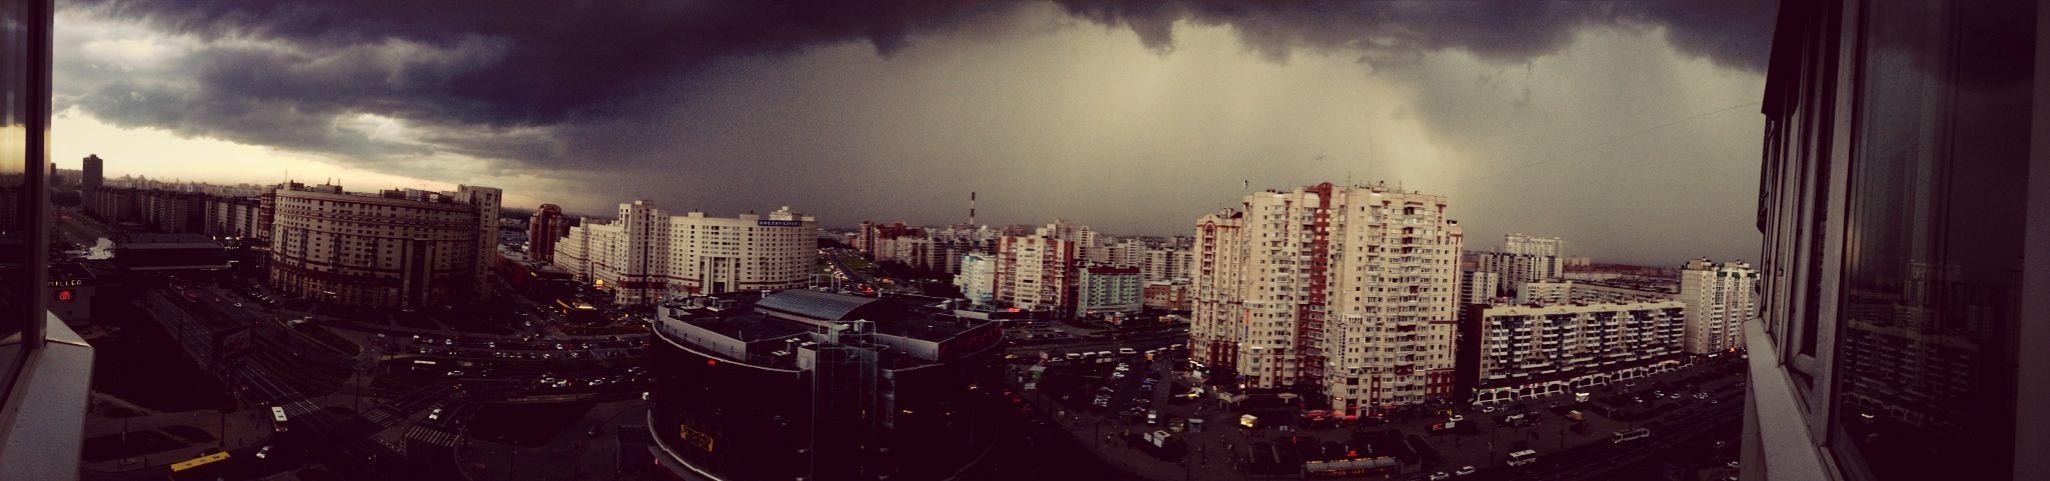 Saint-Petersburg Love My City